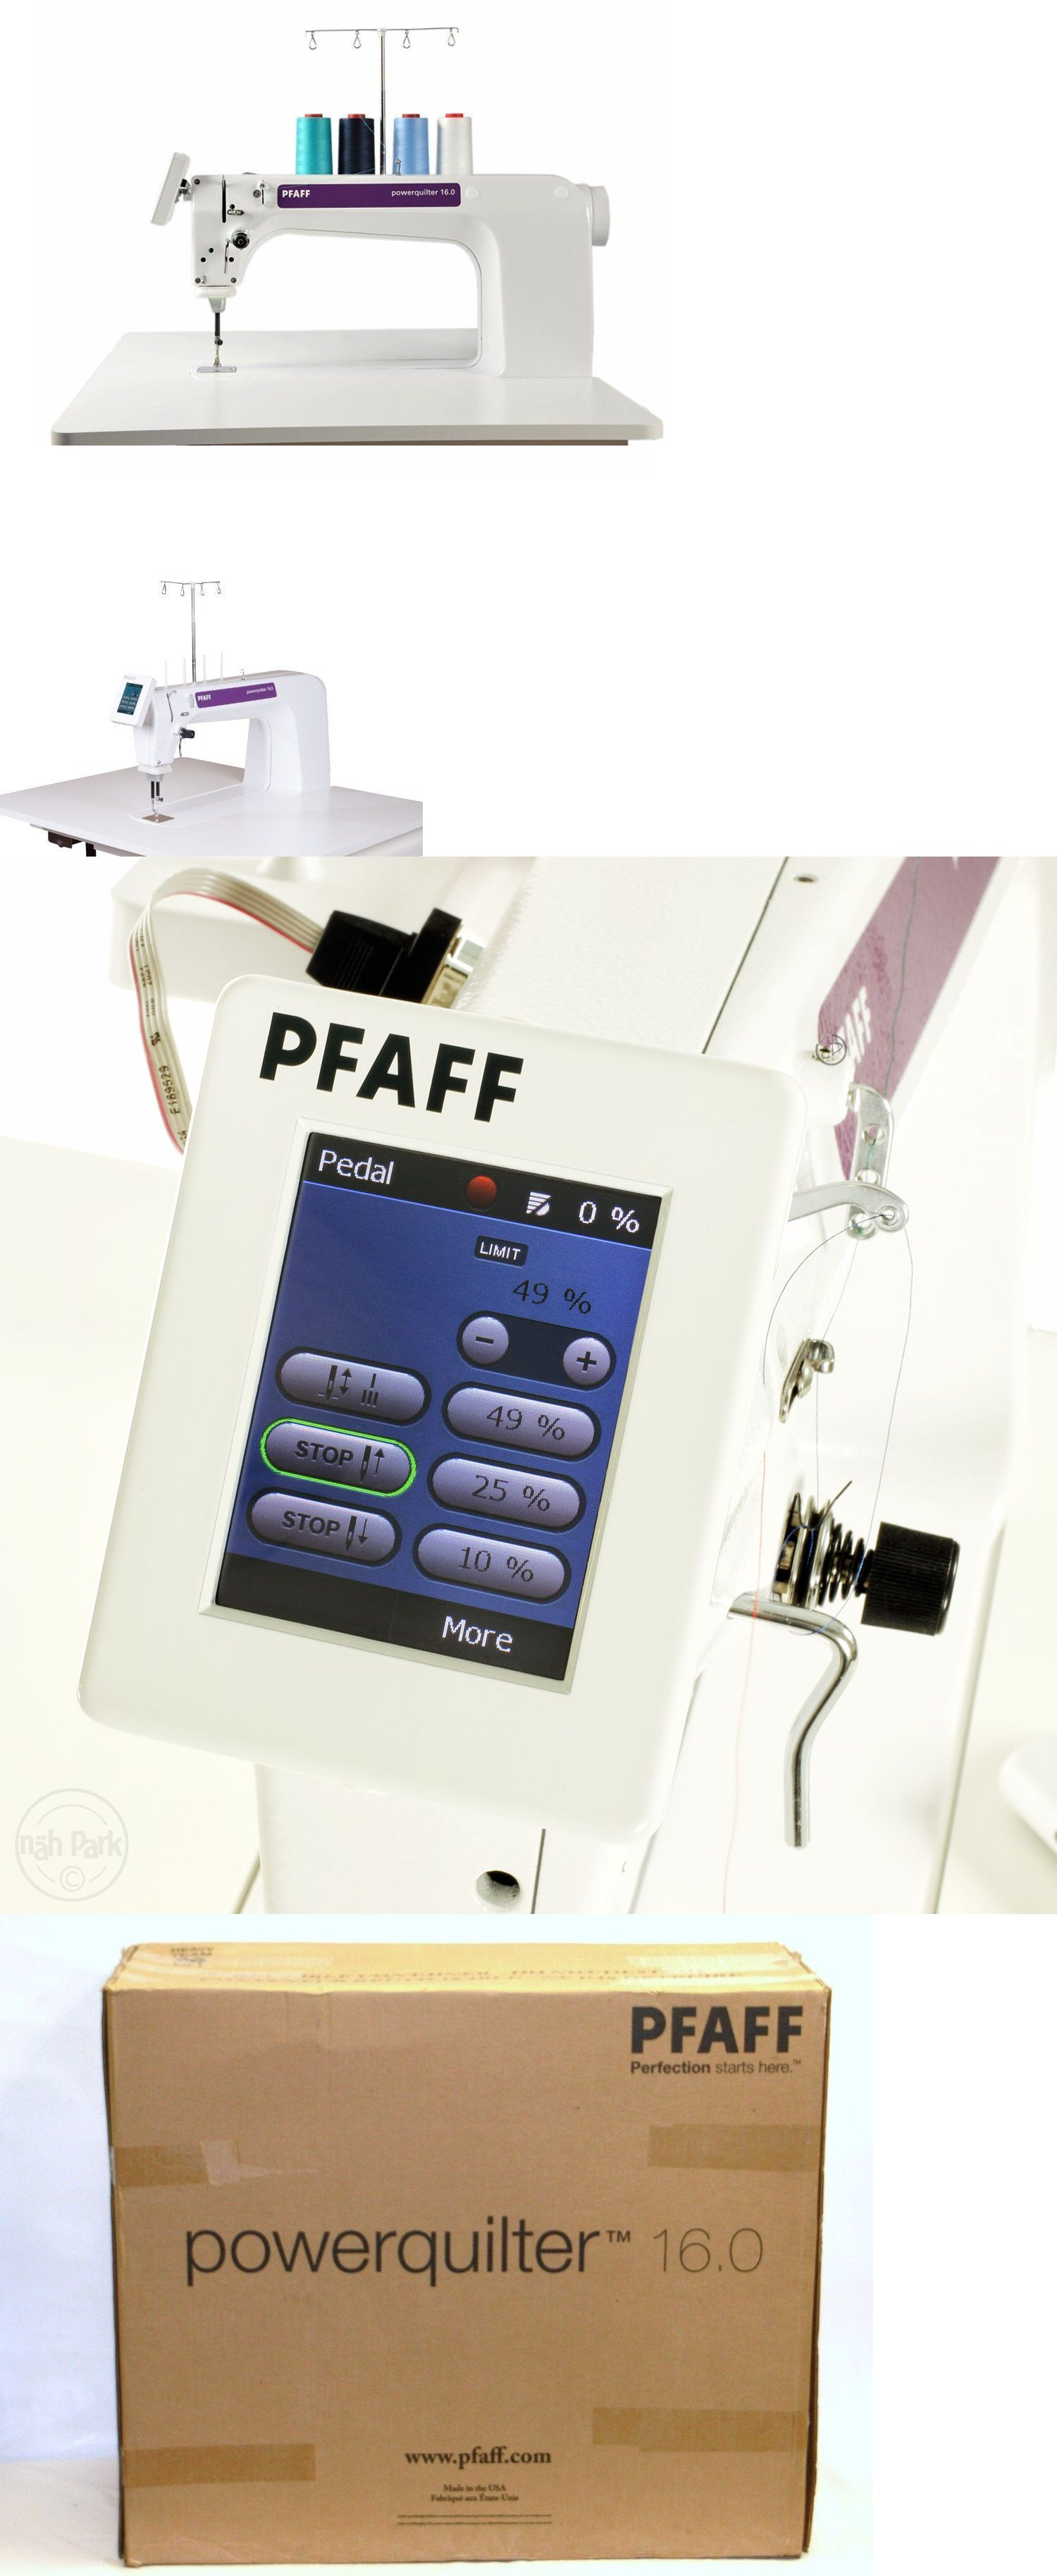 Sewing Machines and Sergers 3118: Pfaff Power Quilter 16.0 ... : pfaff long arm quilting machine - Adamdwight.com